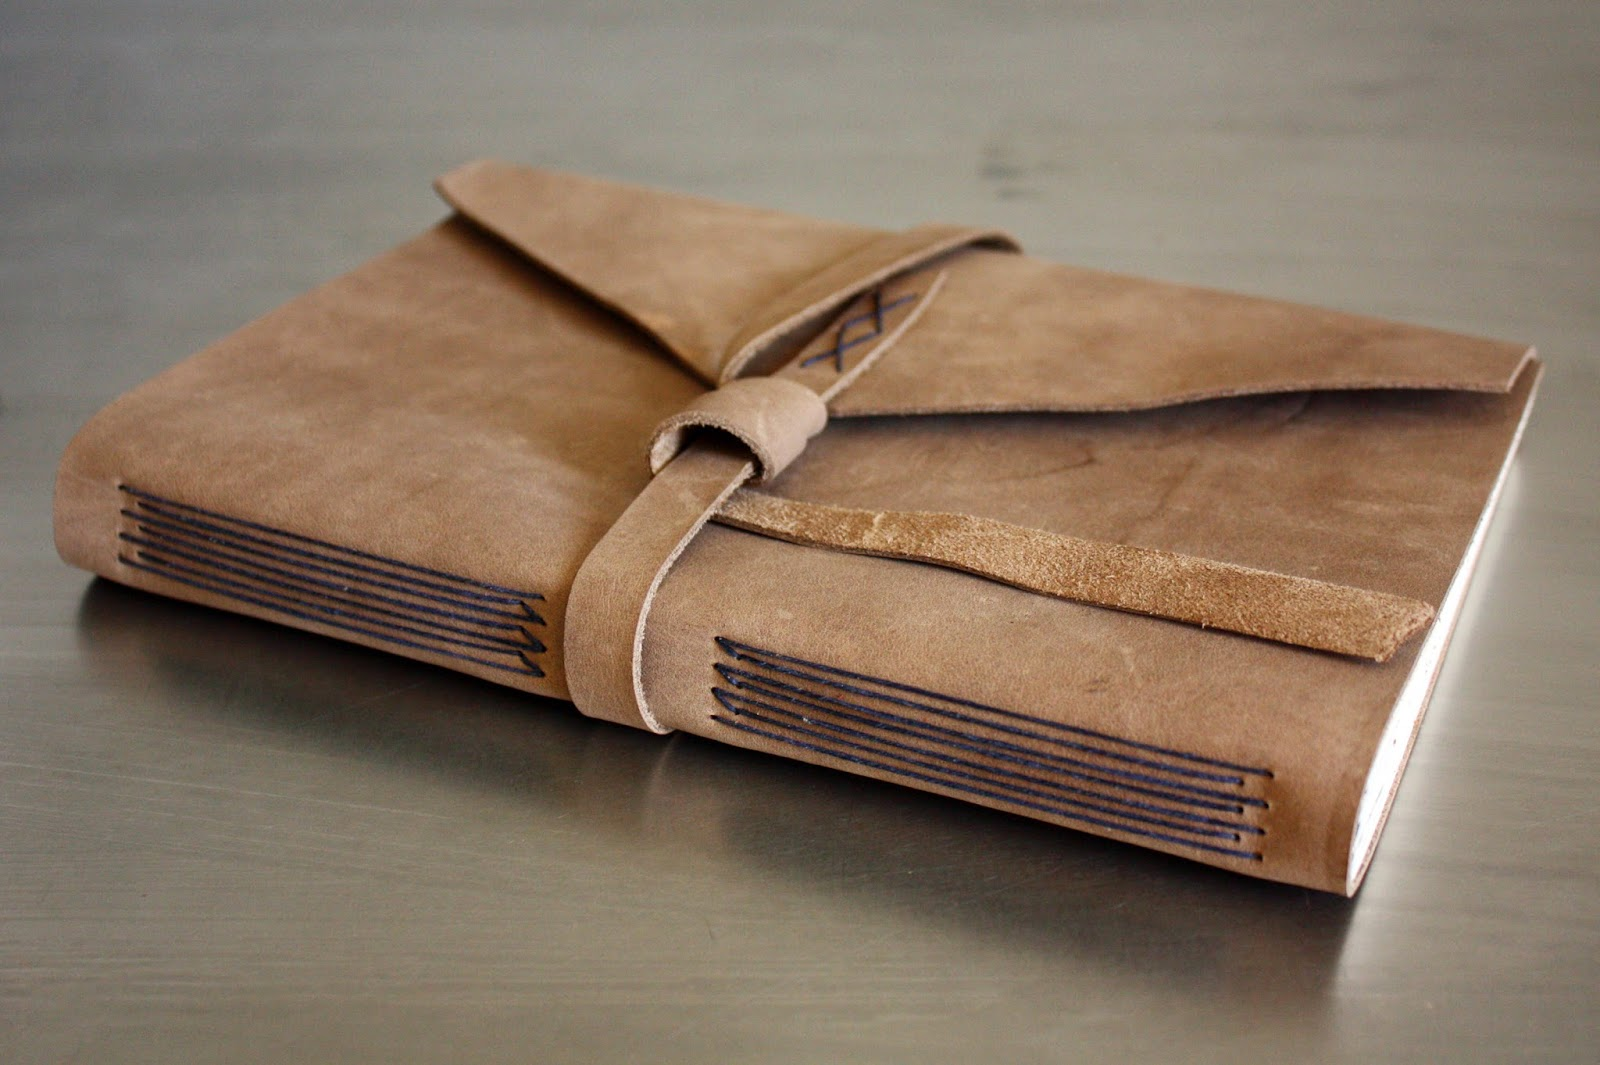 Leather longstitch book handmade by linenlaid&felt